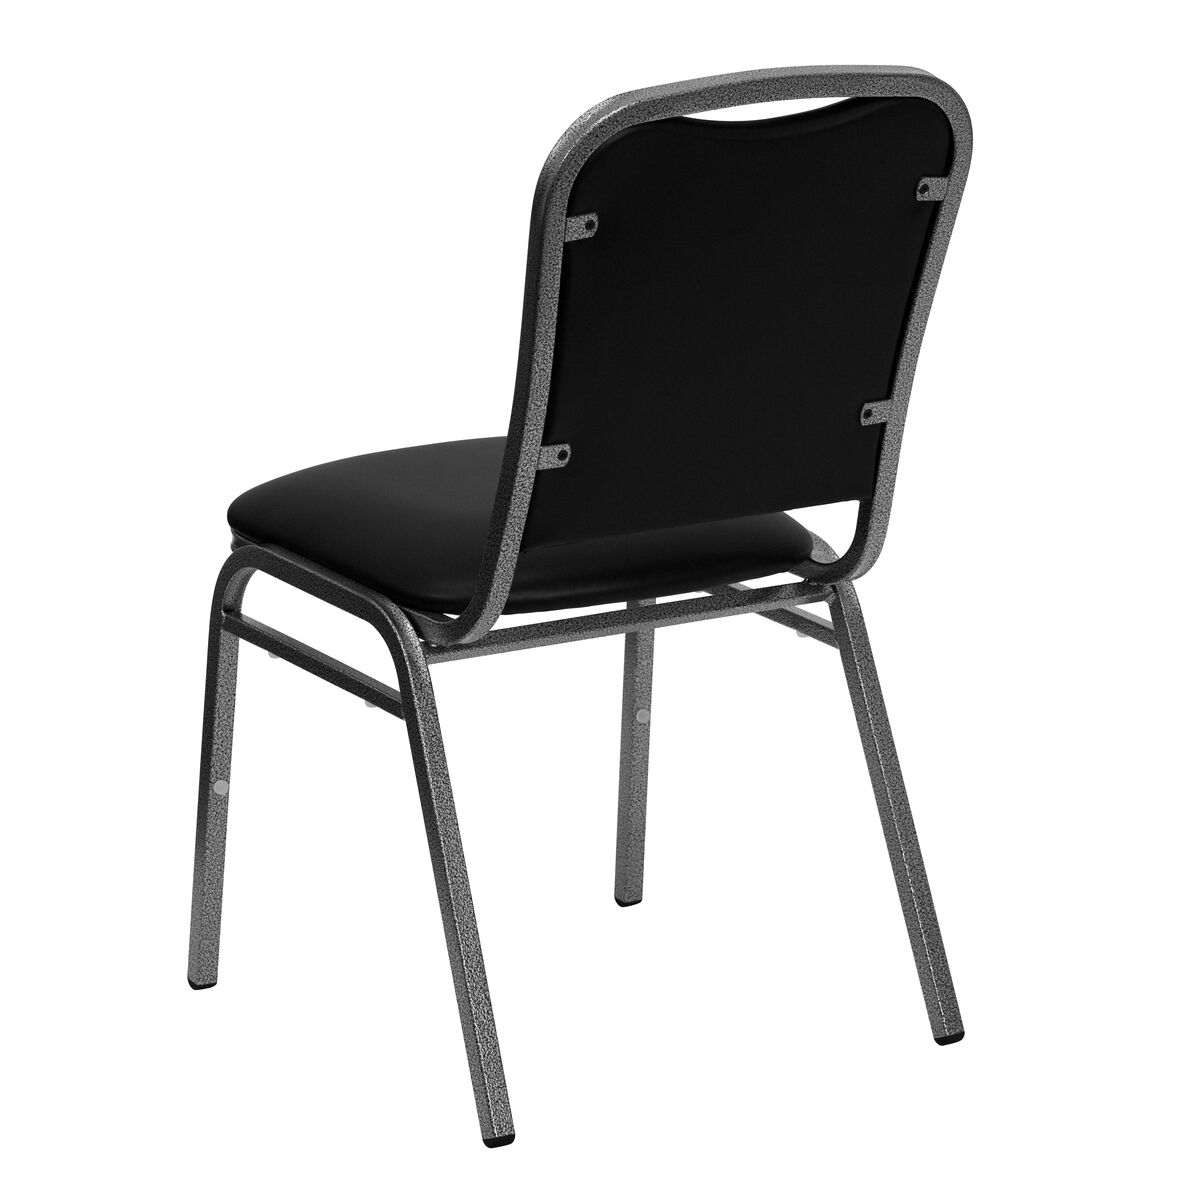 Hercules Series Stacking Banquet Chair In Black Vinyl